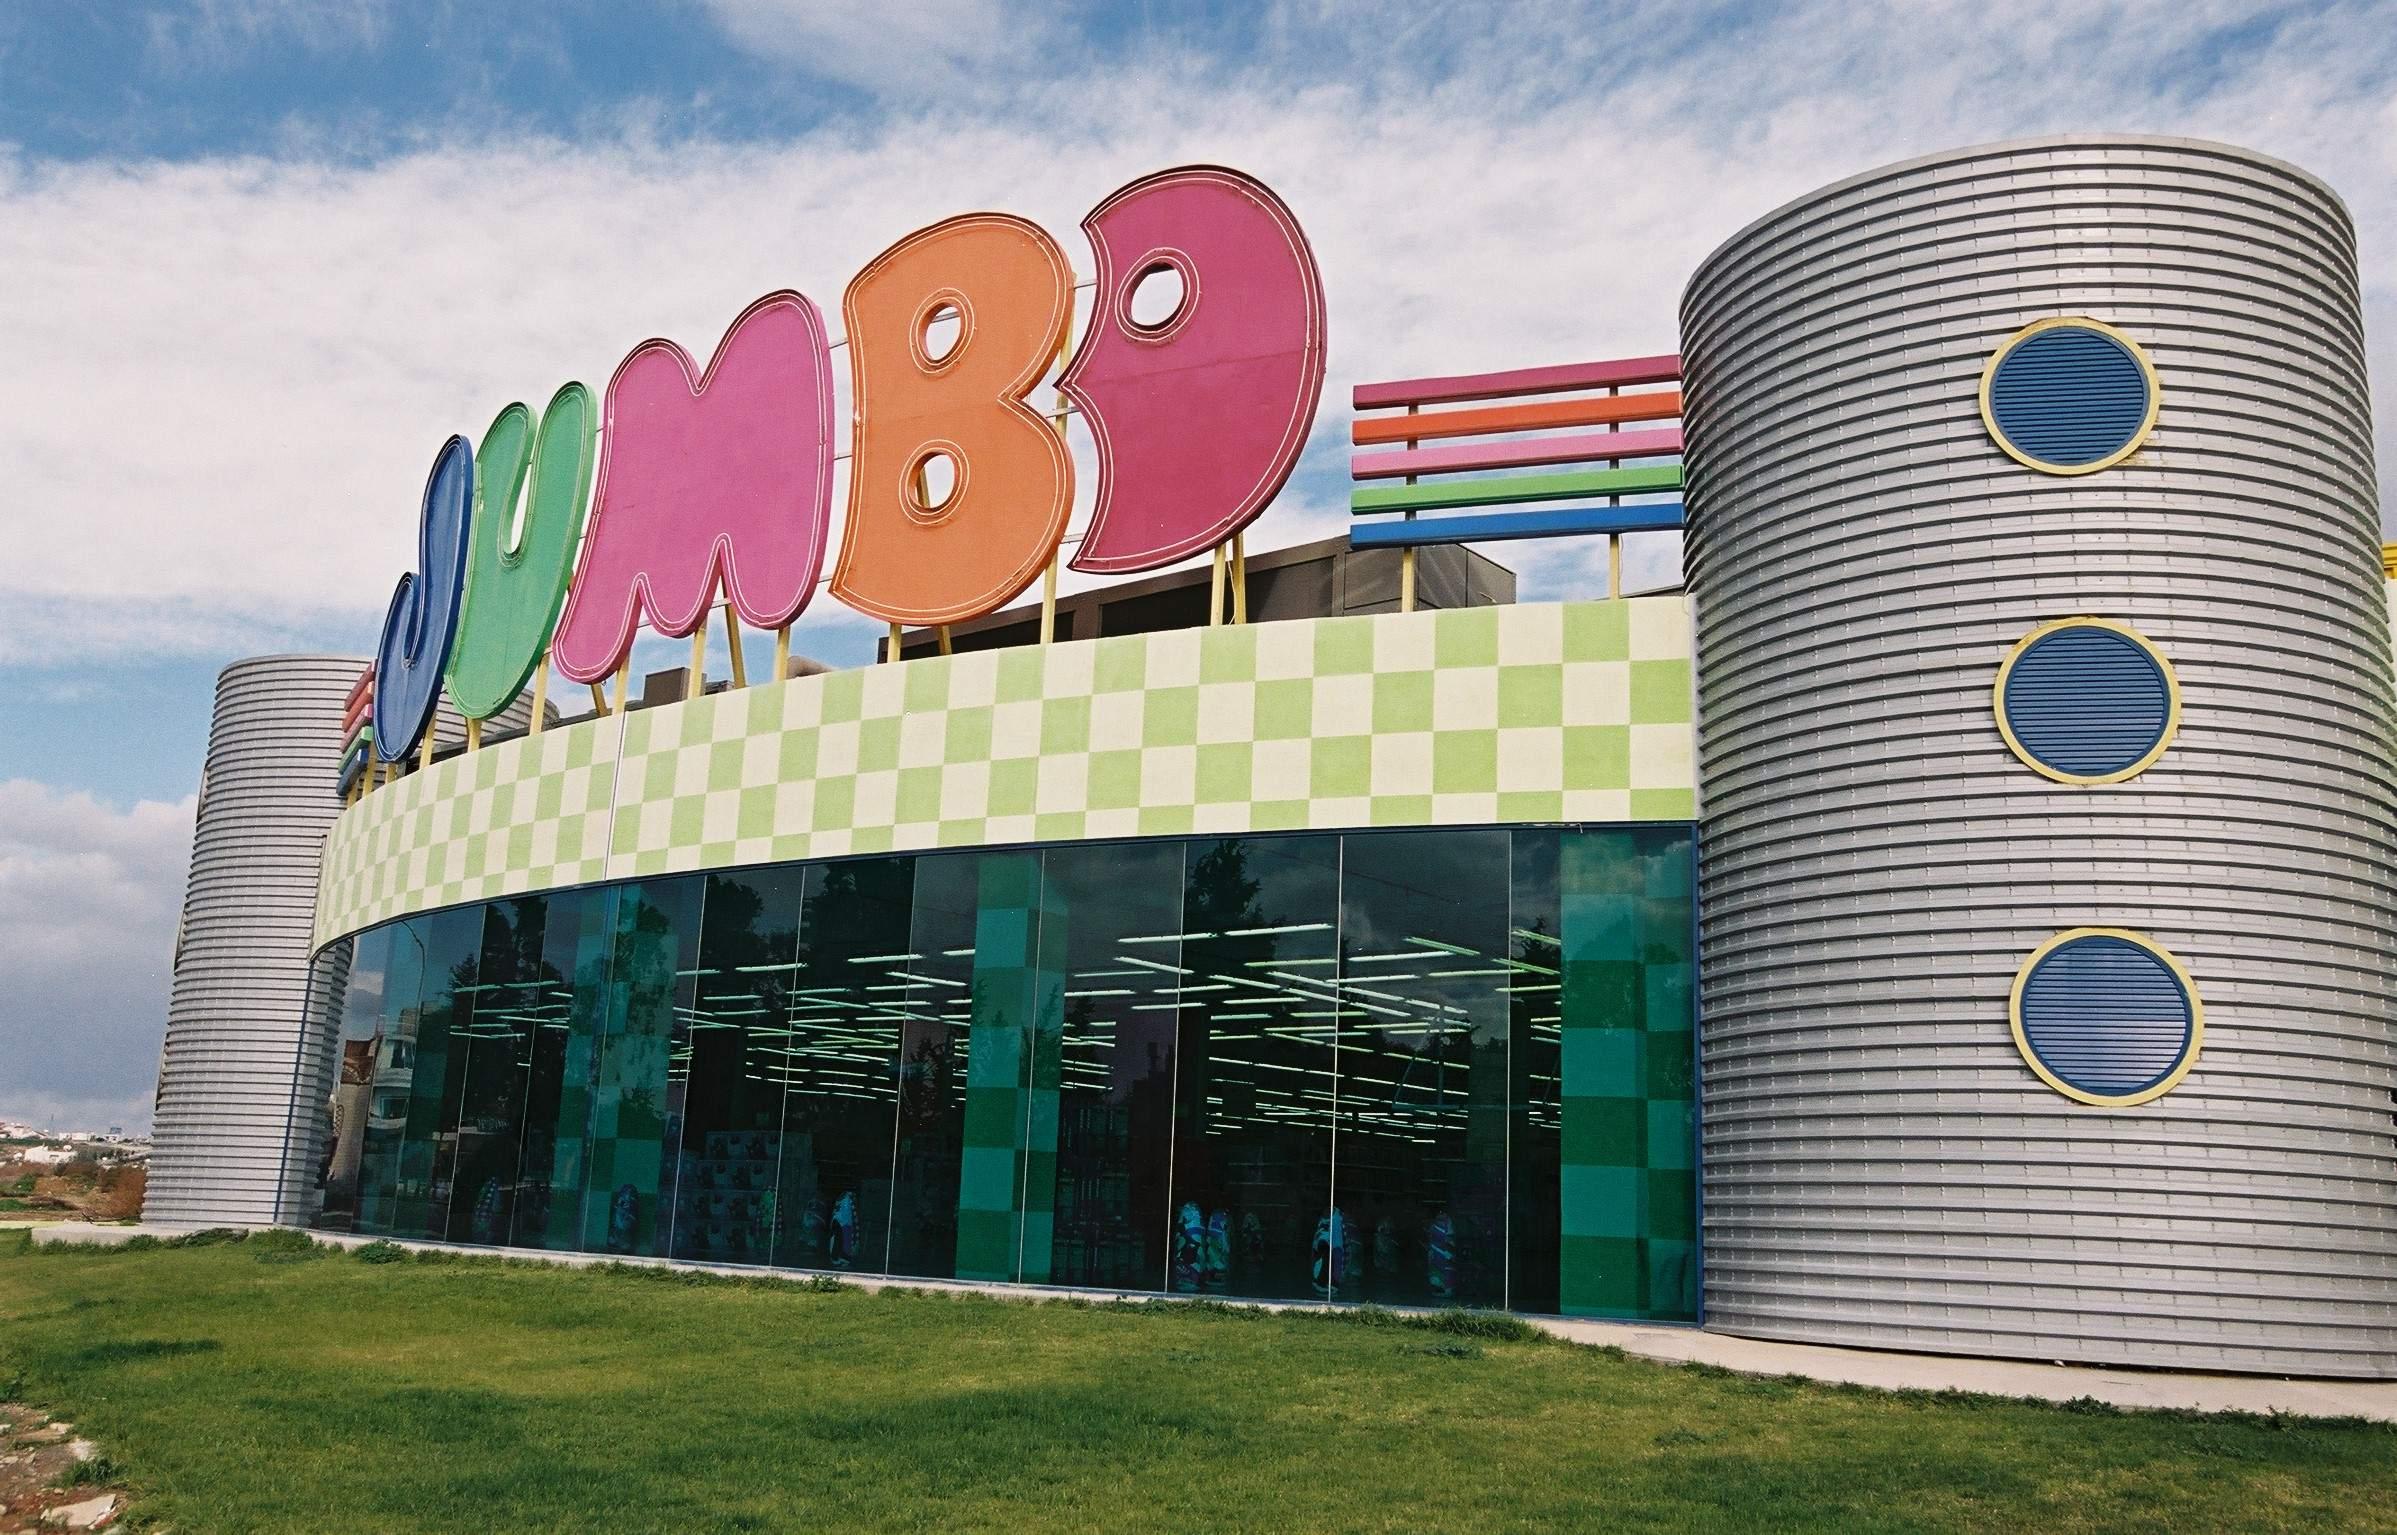 Jumbo: αποπληρωμή δανείου 145 εκατ. ευρώ   tovima.gr